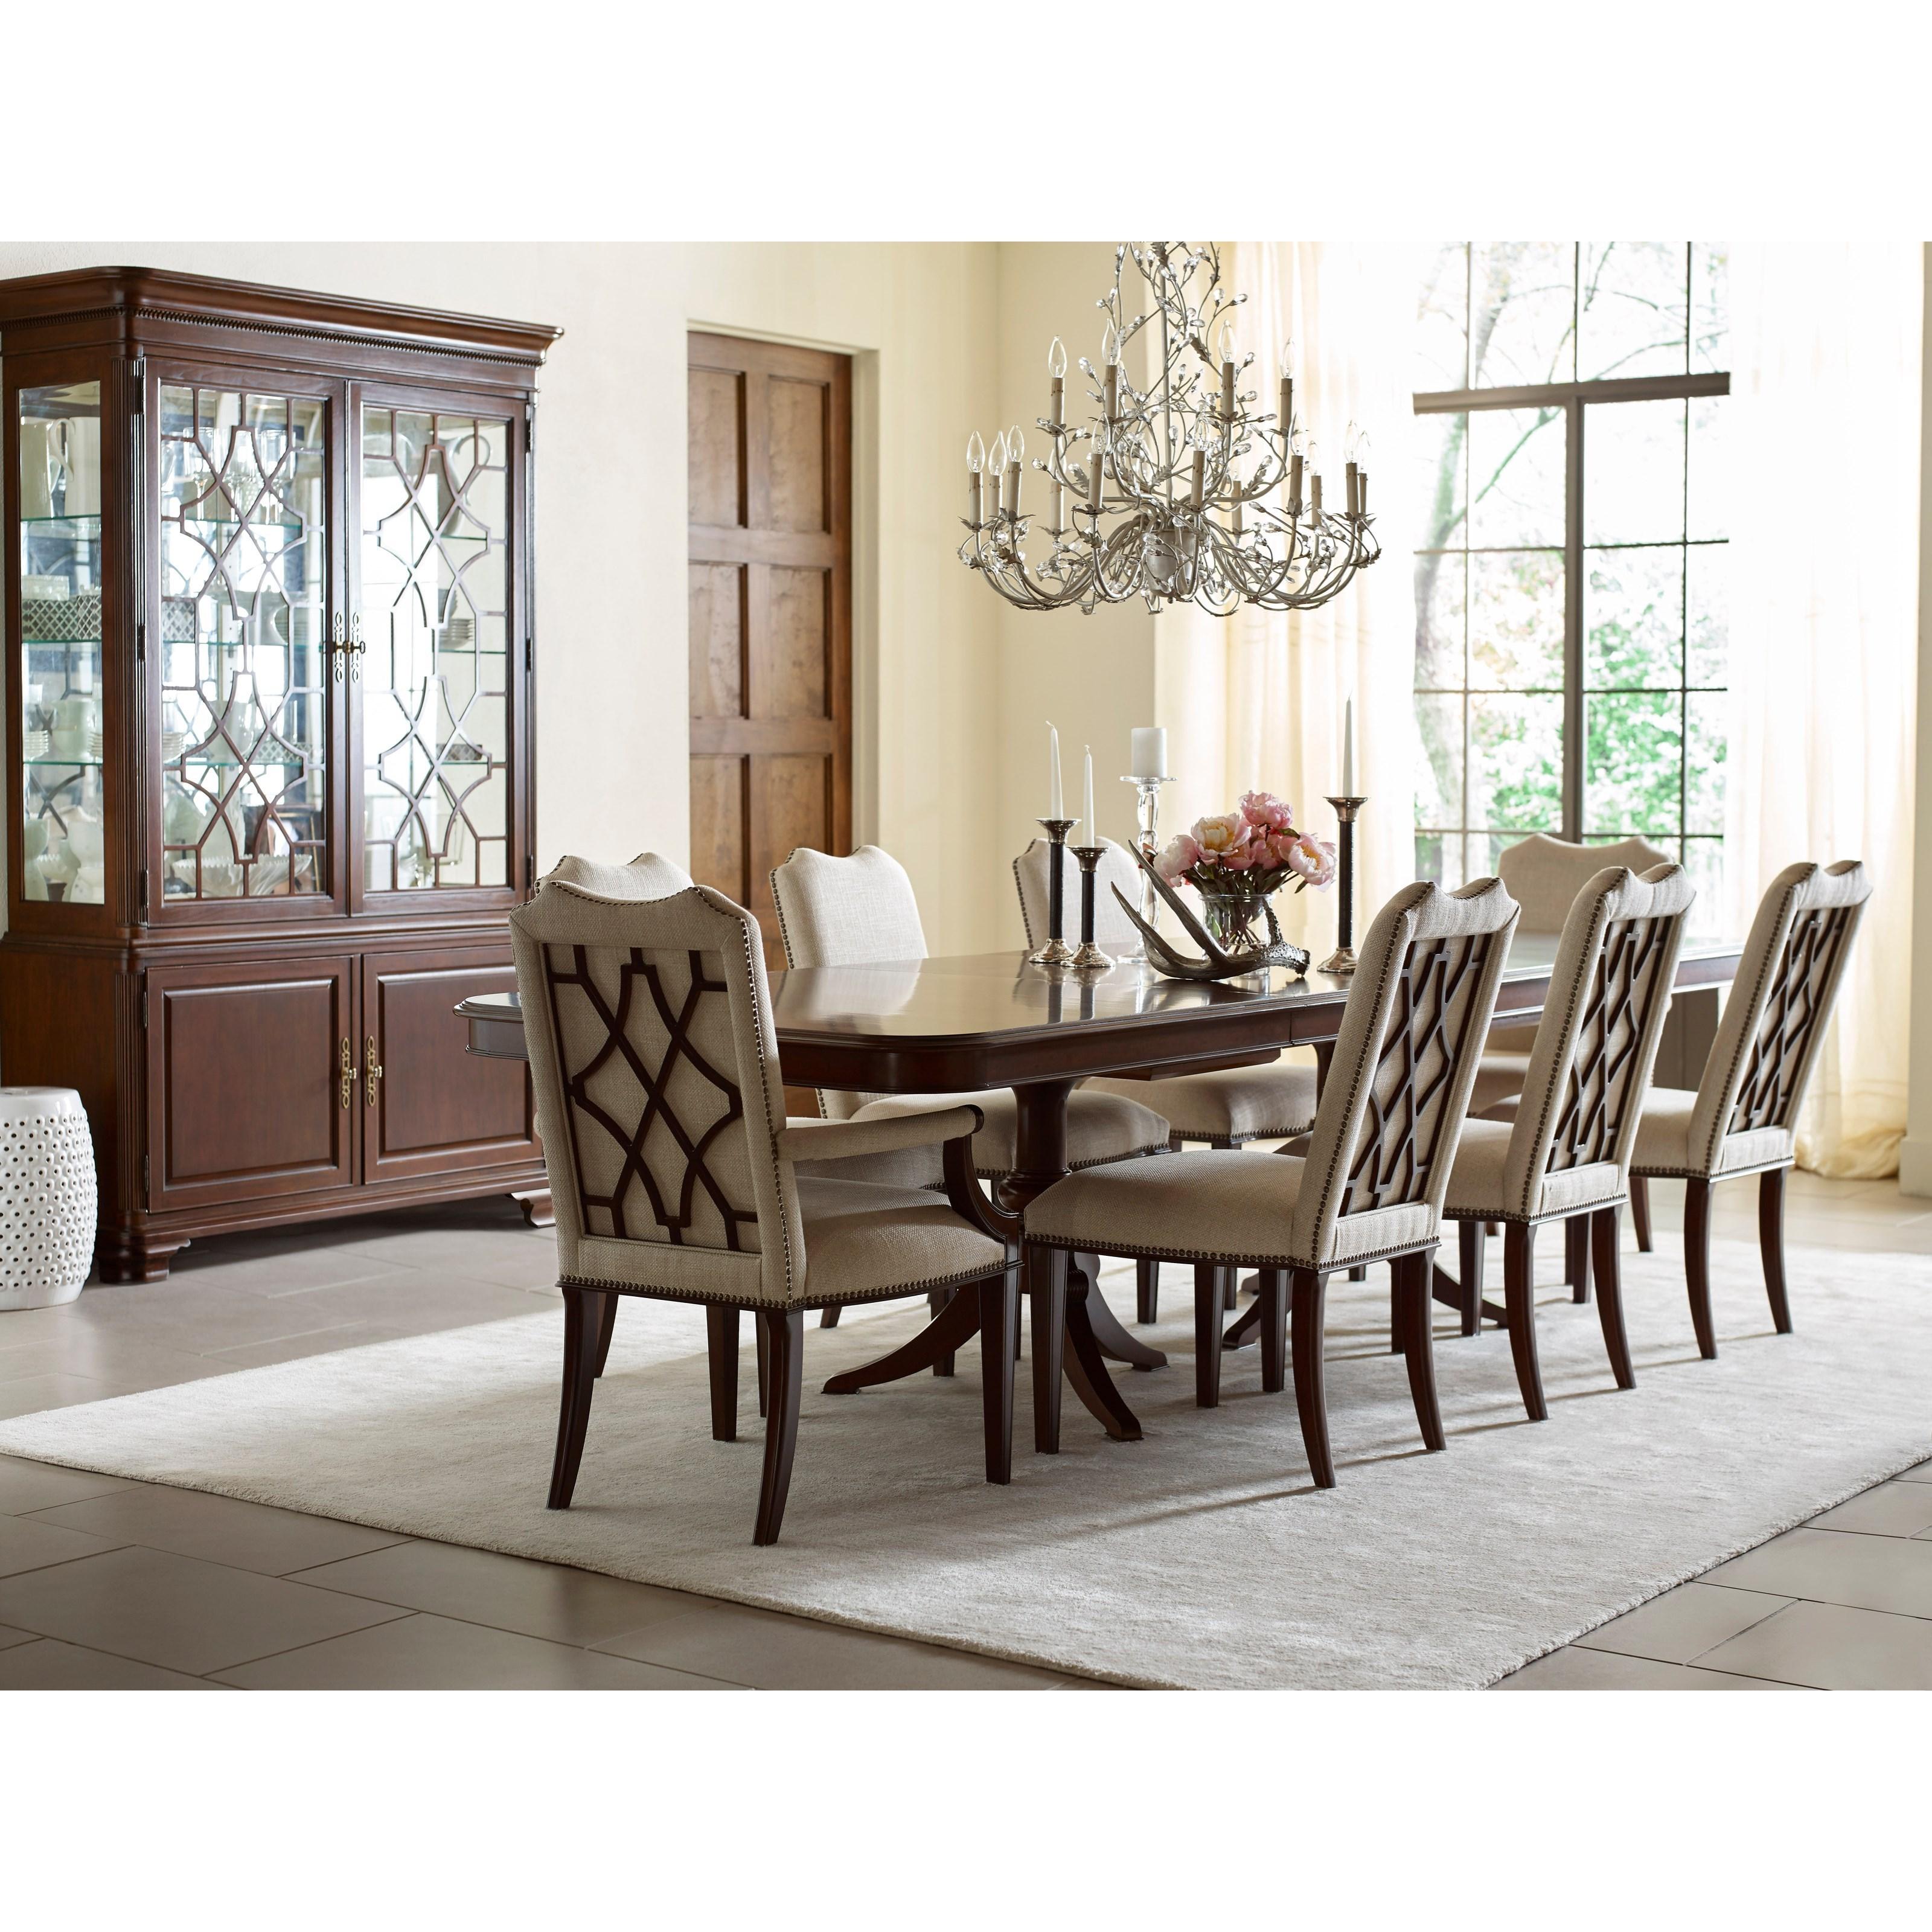 ... Kincaid Furniture HadleighChina Cabinet